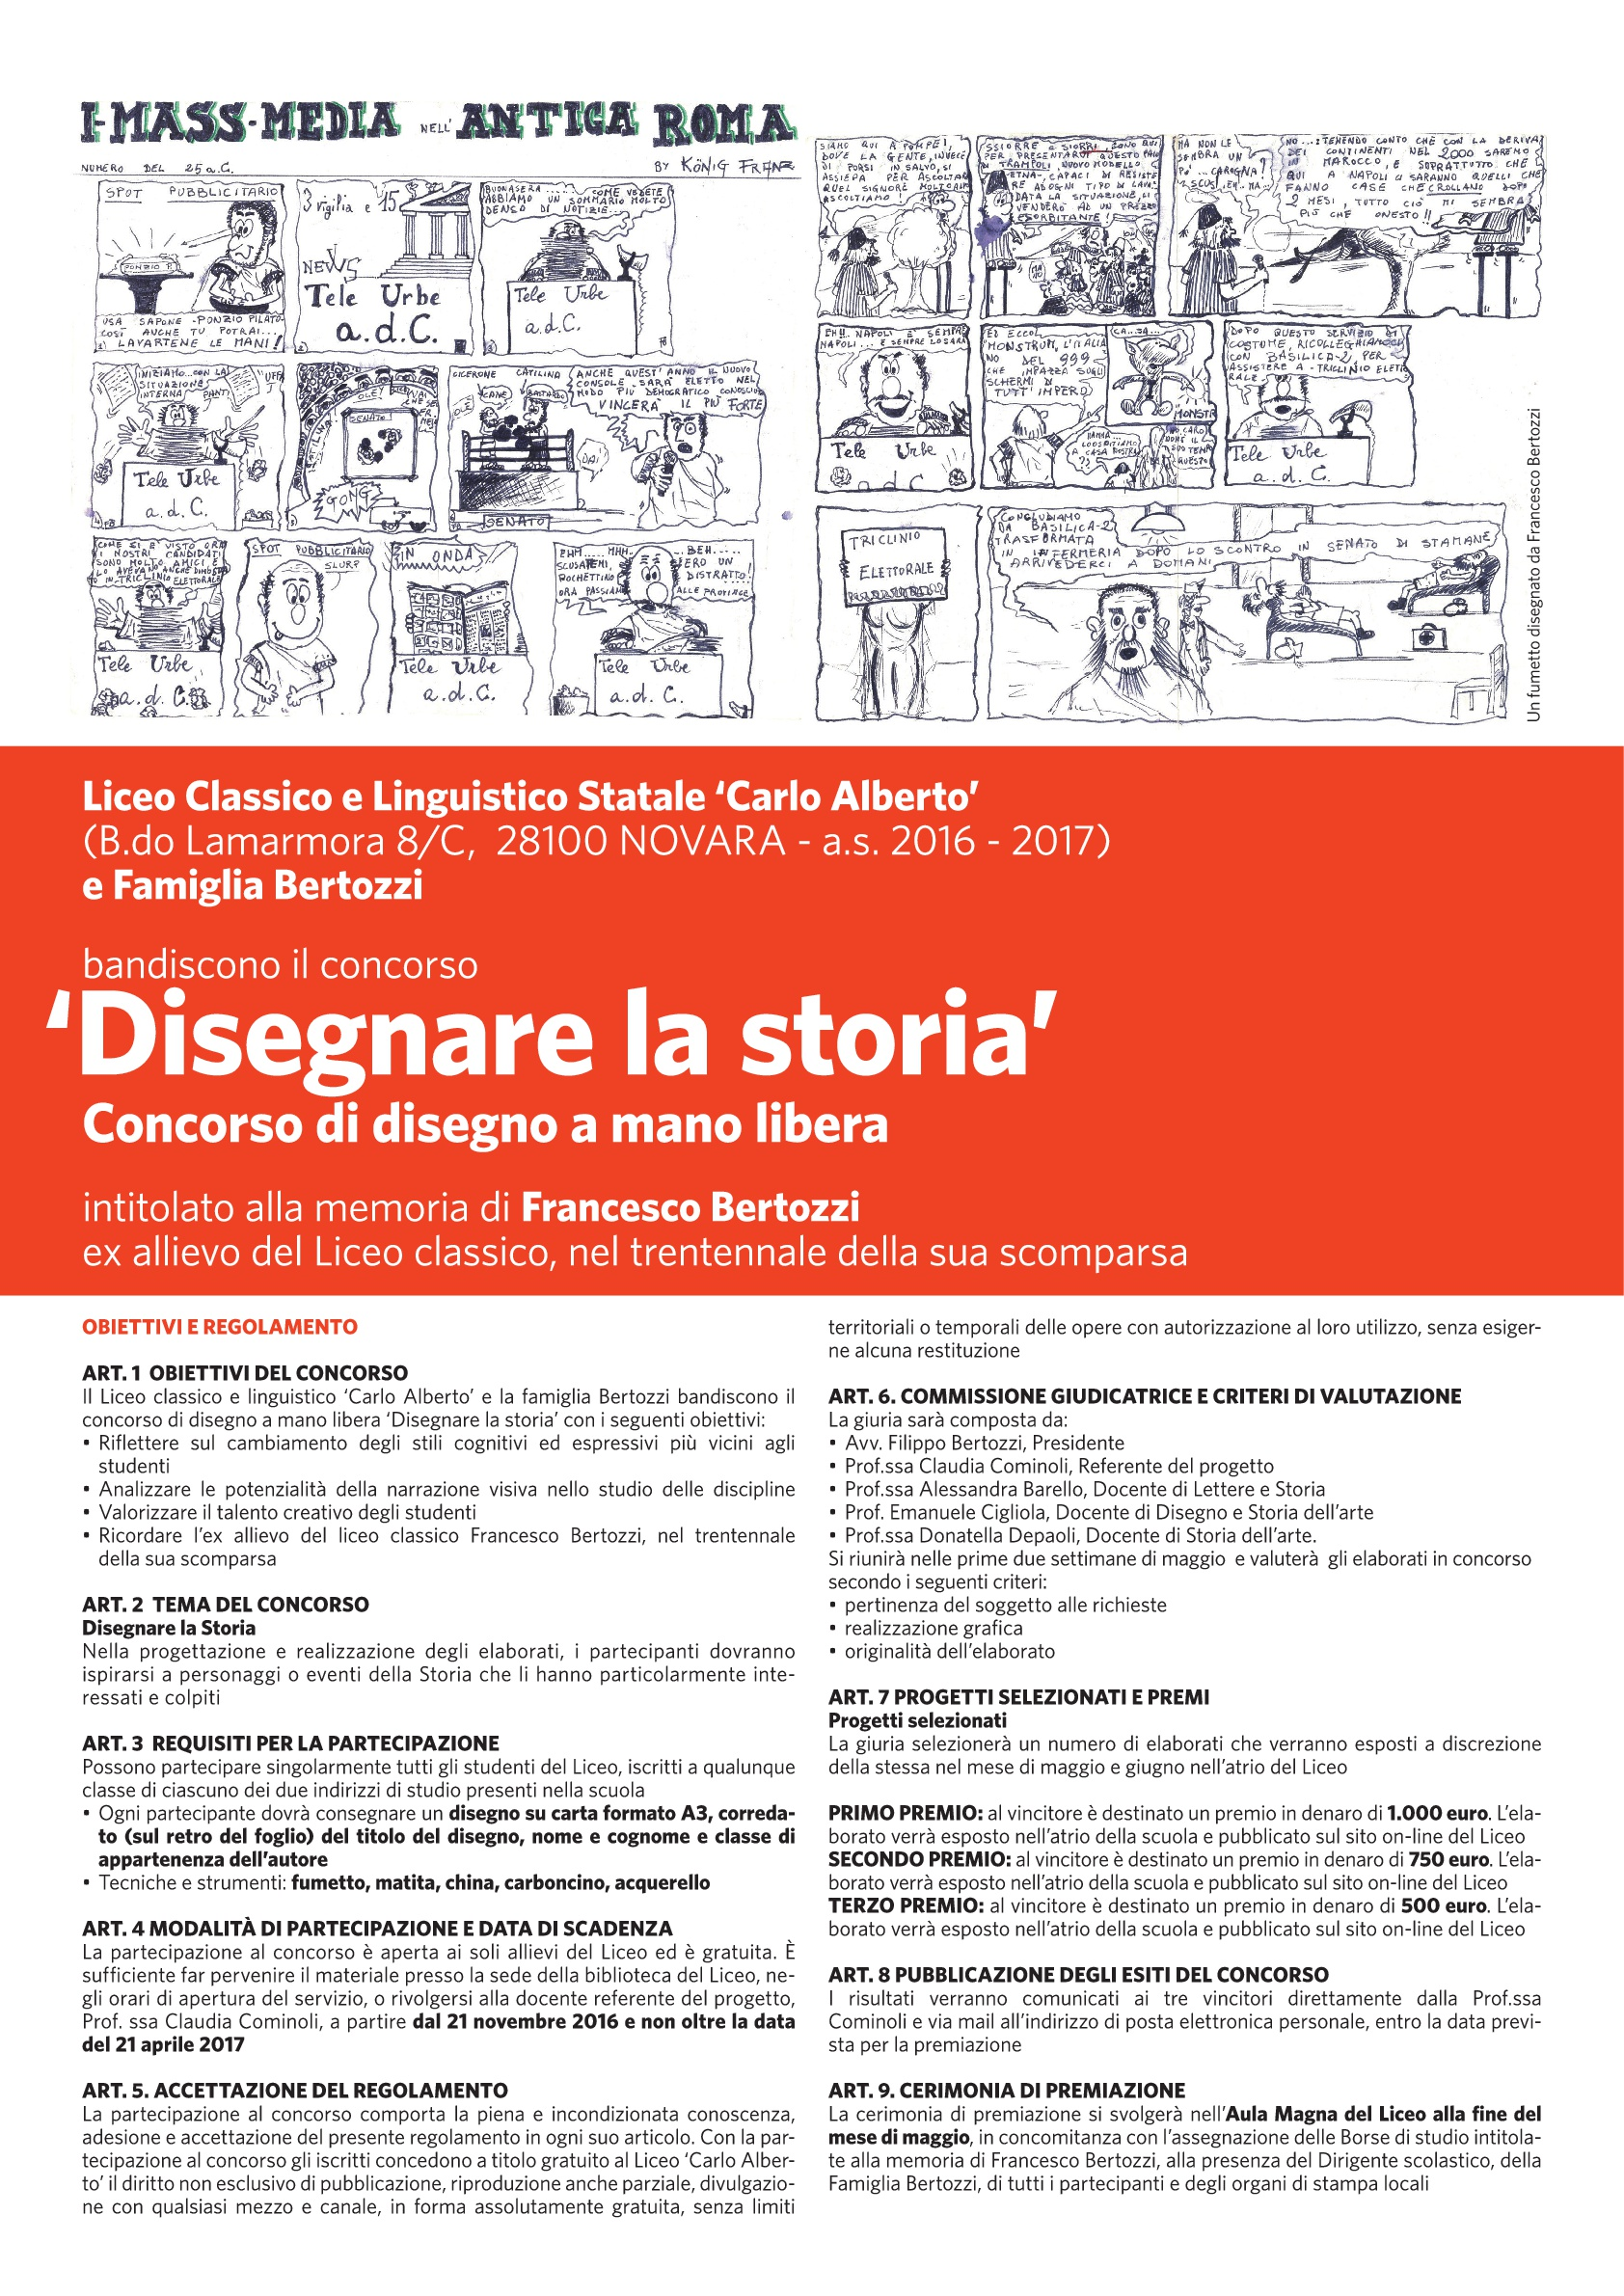 Locandina_Concorso_Bertozzi_2017-001